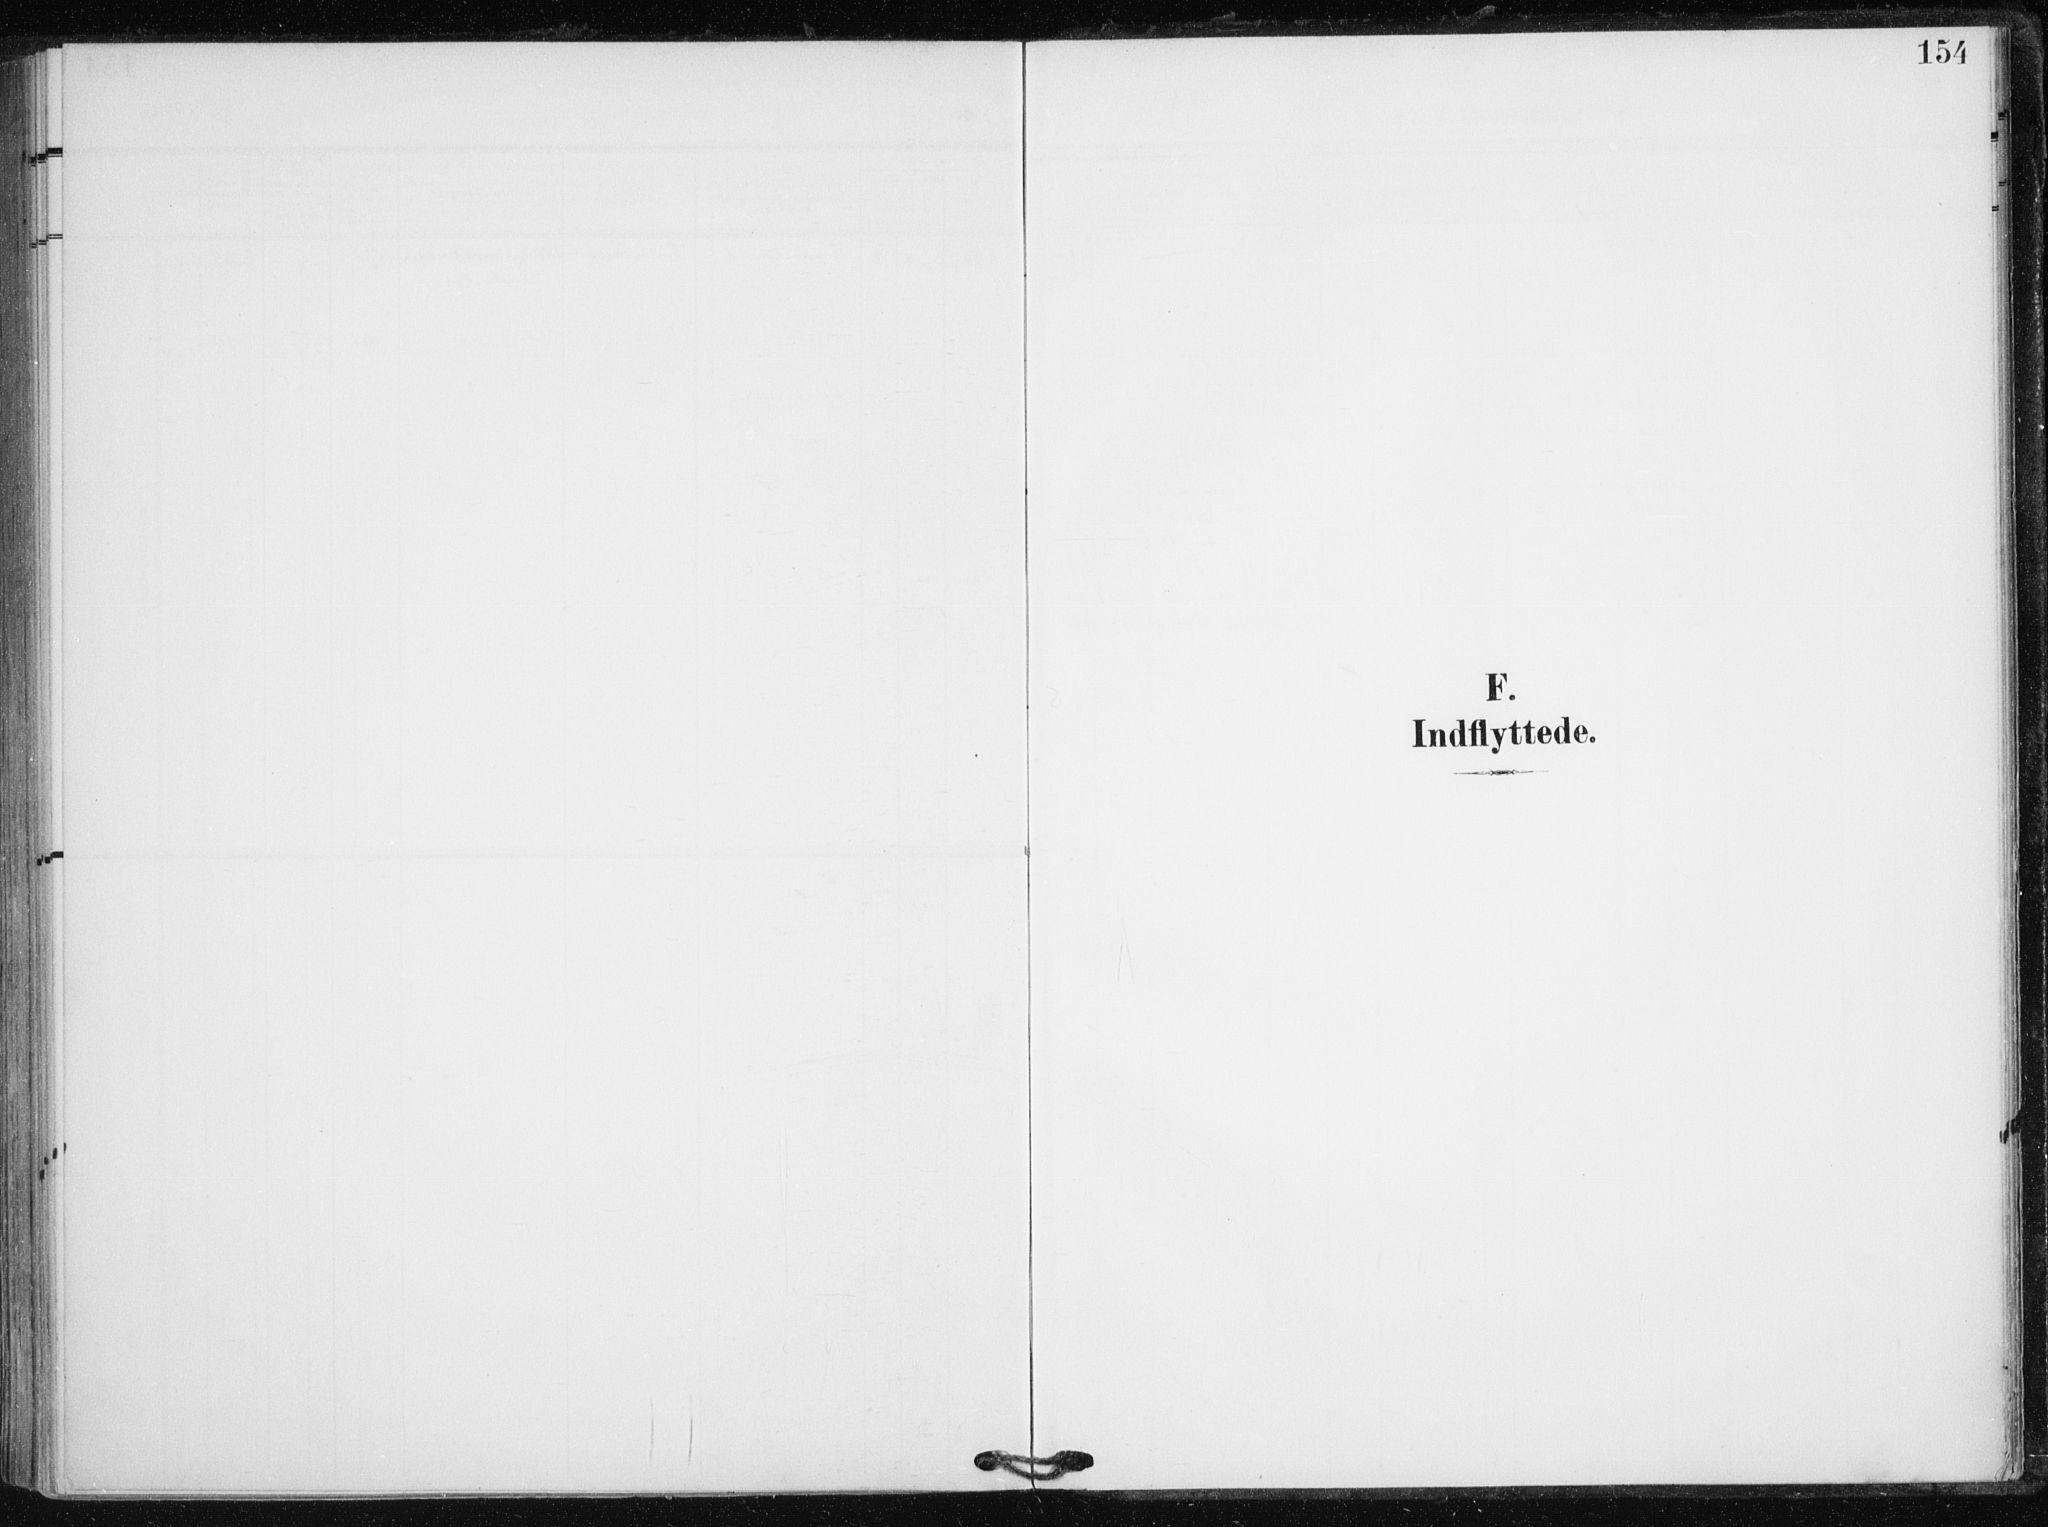 SATØ, Tranøy sokneprestkontor, I/Ia/Iaa/L0013kirke: Ministerialbok nr. 13, 1905-1922, s. 154